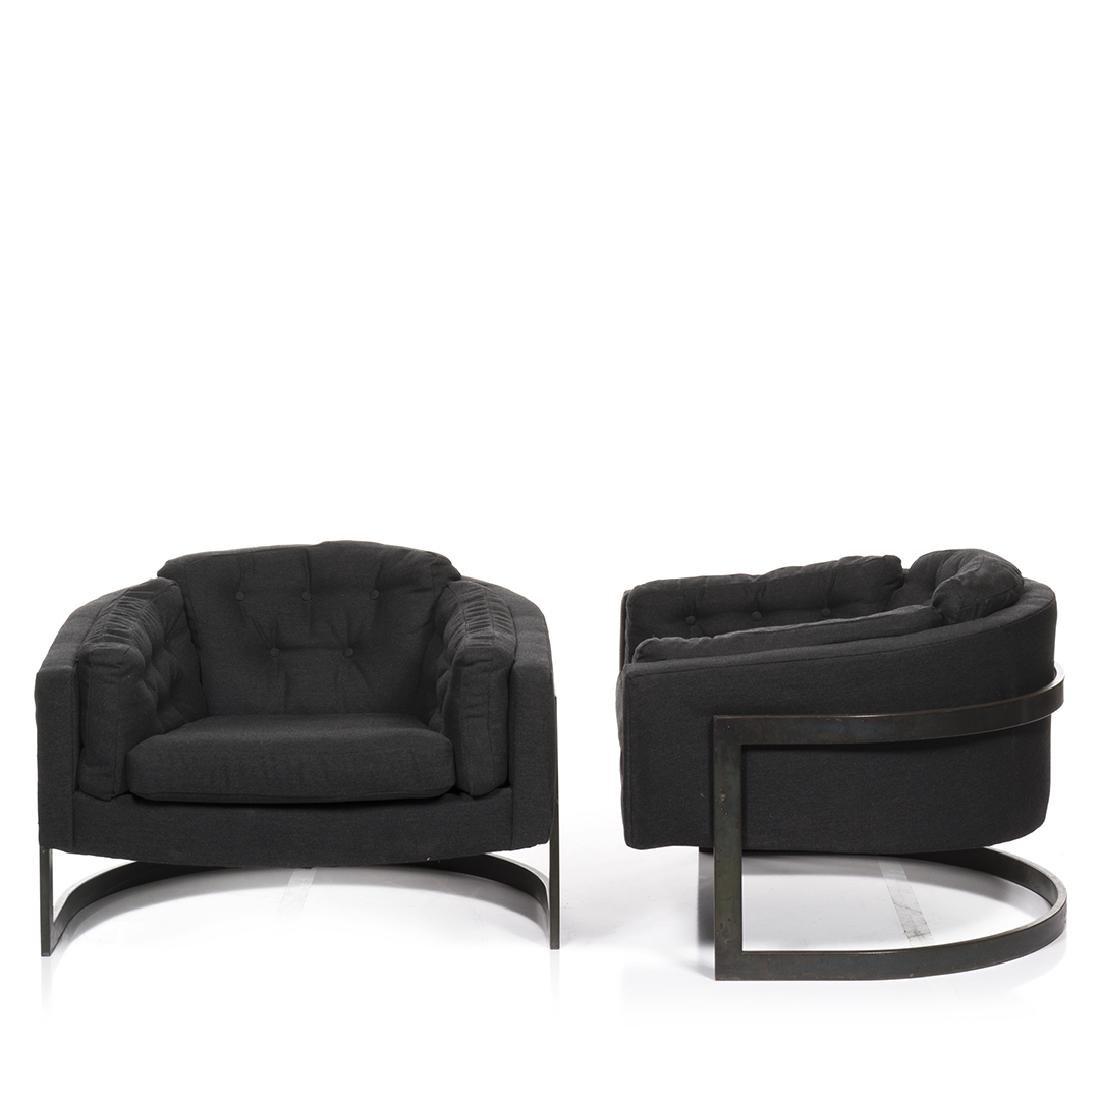 Jules Heumann Bronze Lounge Chairs (2) - 2